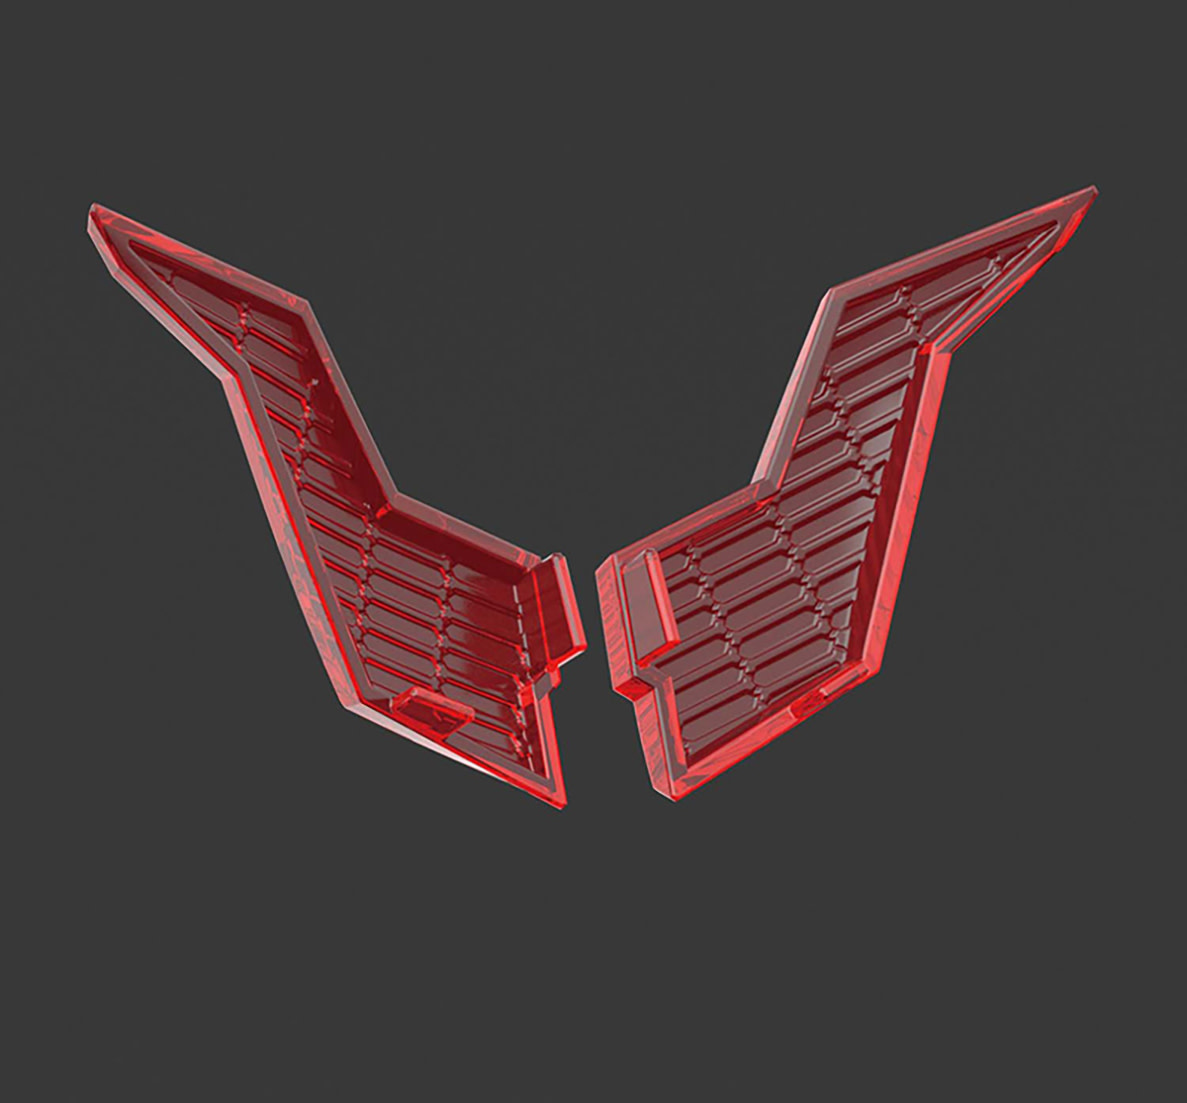 Bandai Mazinger Z - Model Kit - HG 1/144 - Mazinger Z Infitity Version